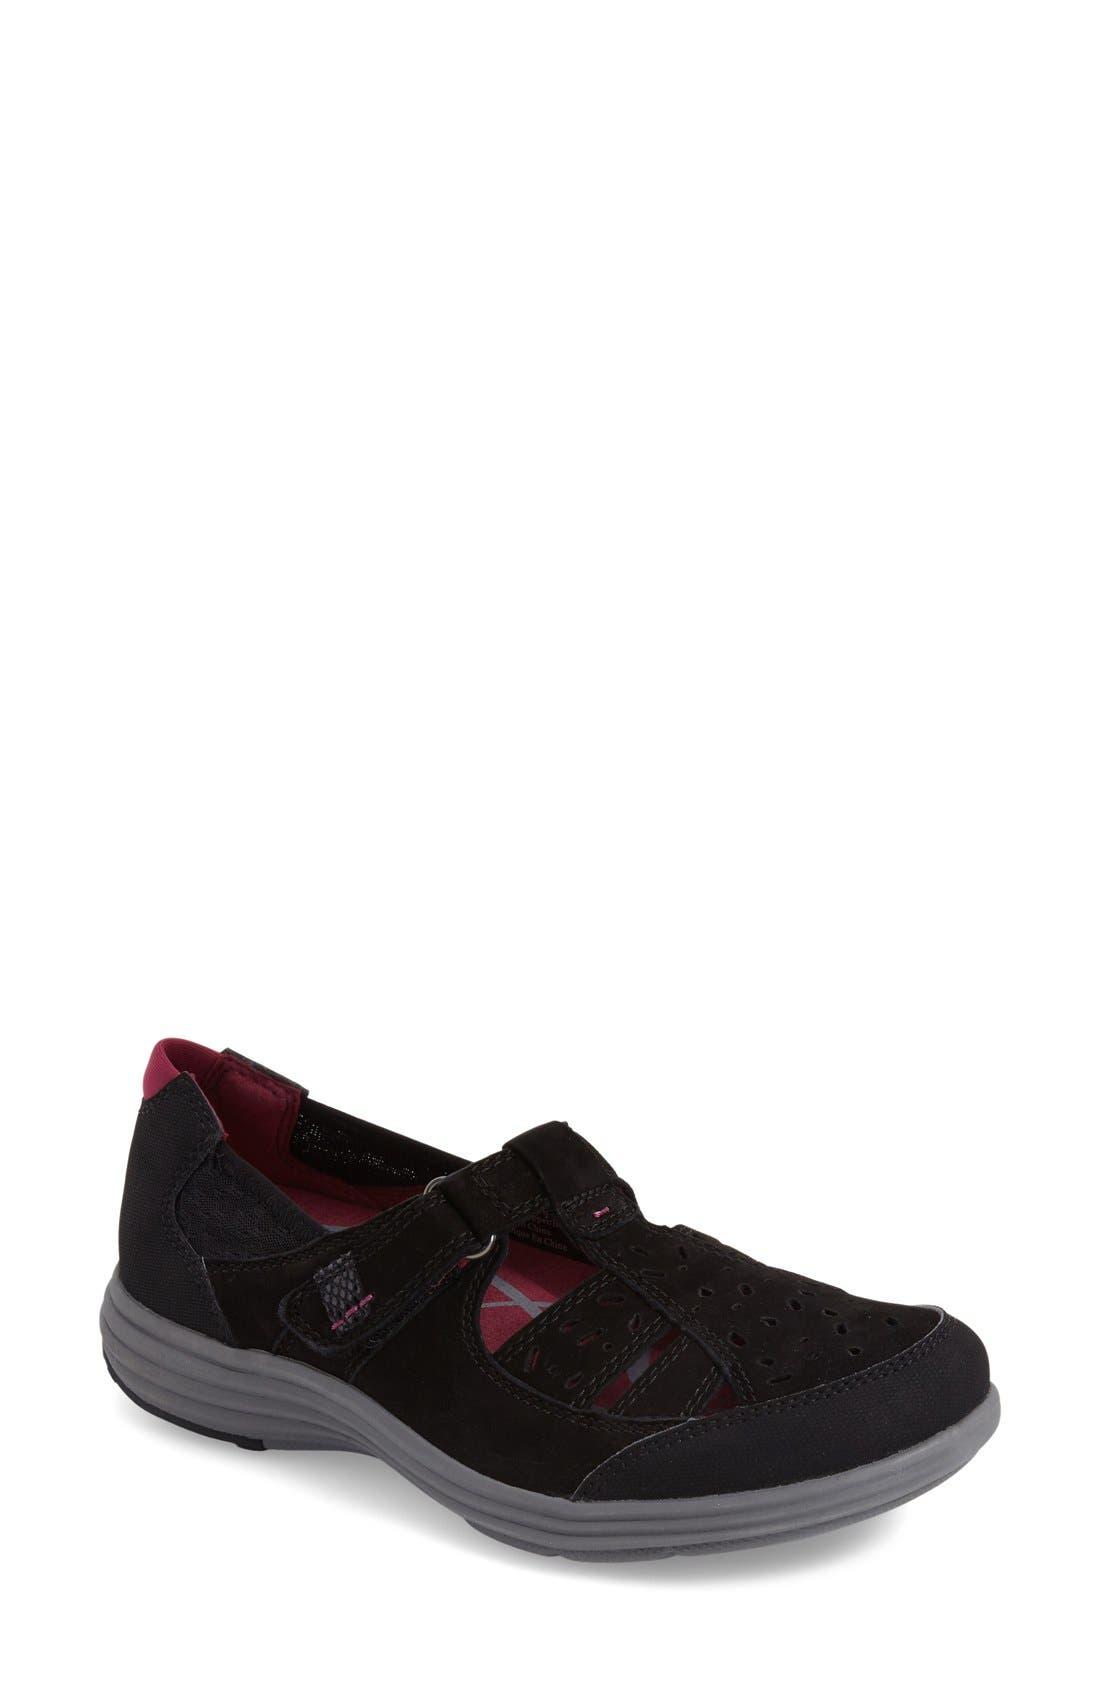 'Barbara' Sneaker,                             Main thumbnail 1, color,                             BLACK LEATHER